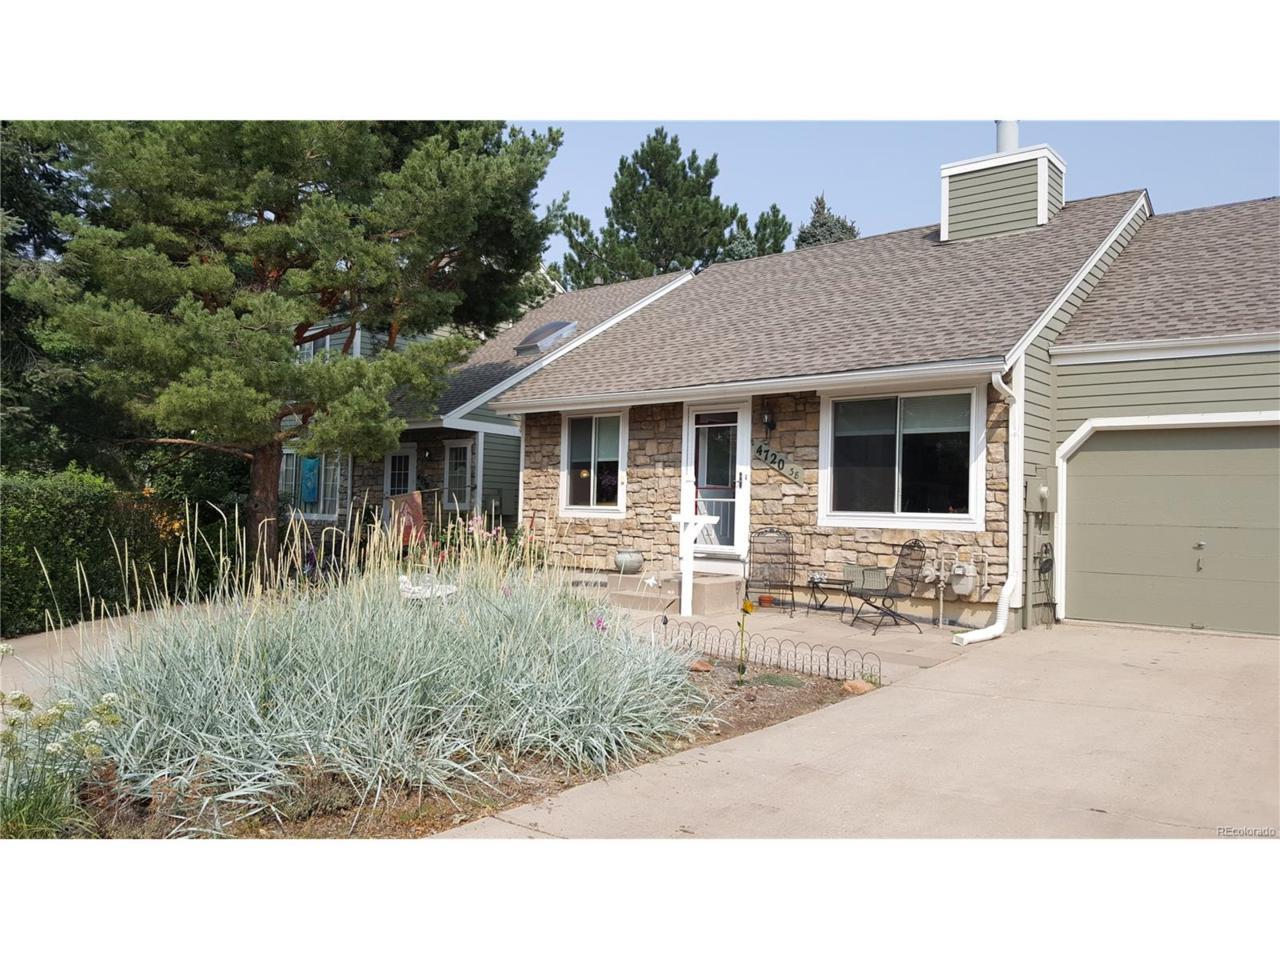 4720 S Dudley Street #38, Denver, CO 80123 (MLS #2515987) :: 8z Real Estate